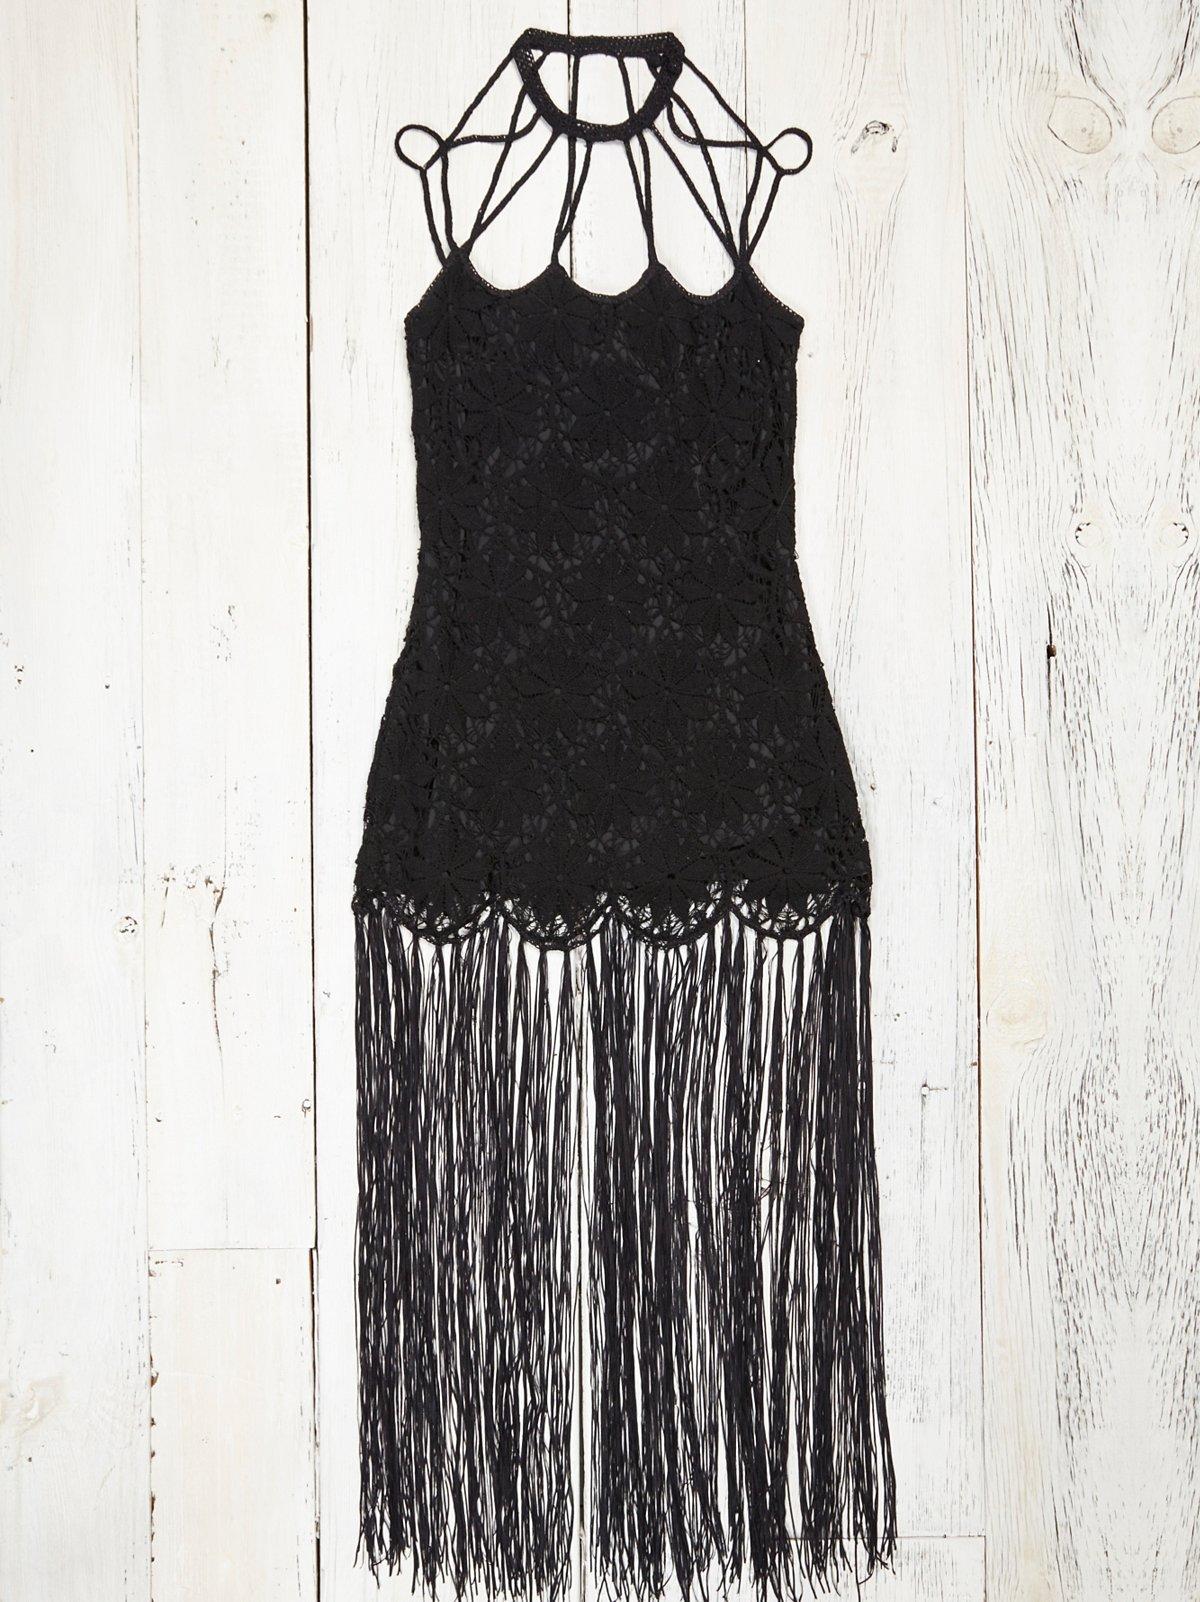 Vintage 1980s Moschino Dress